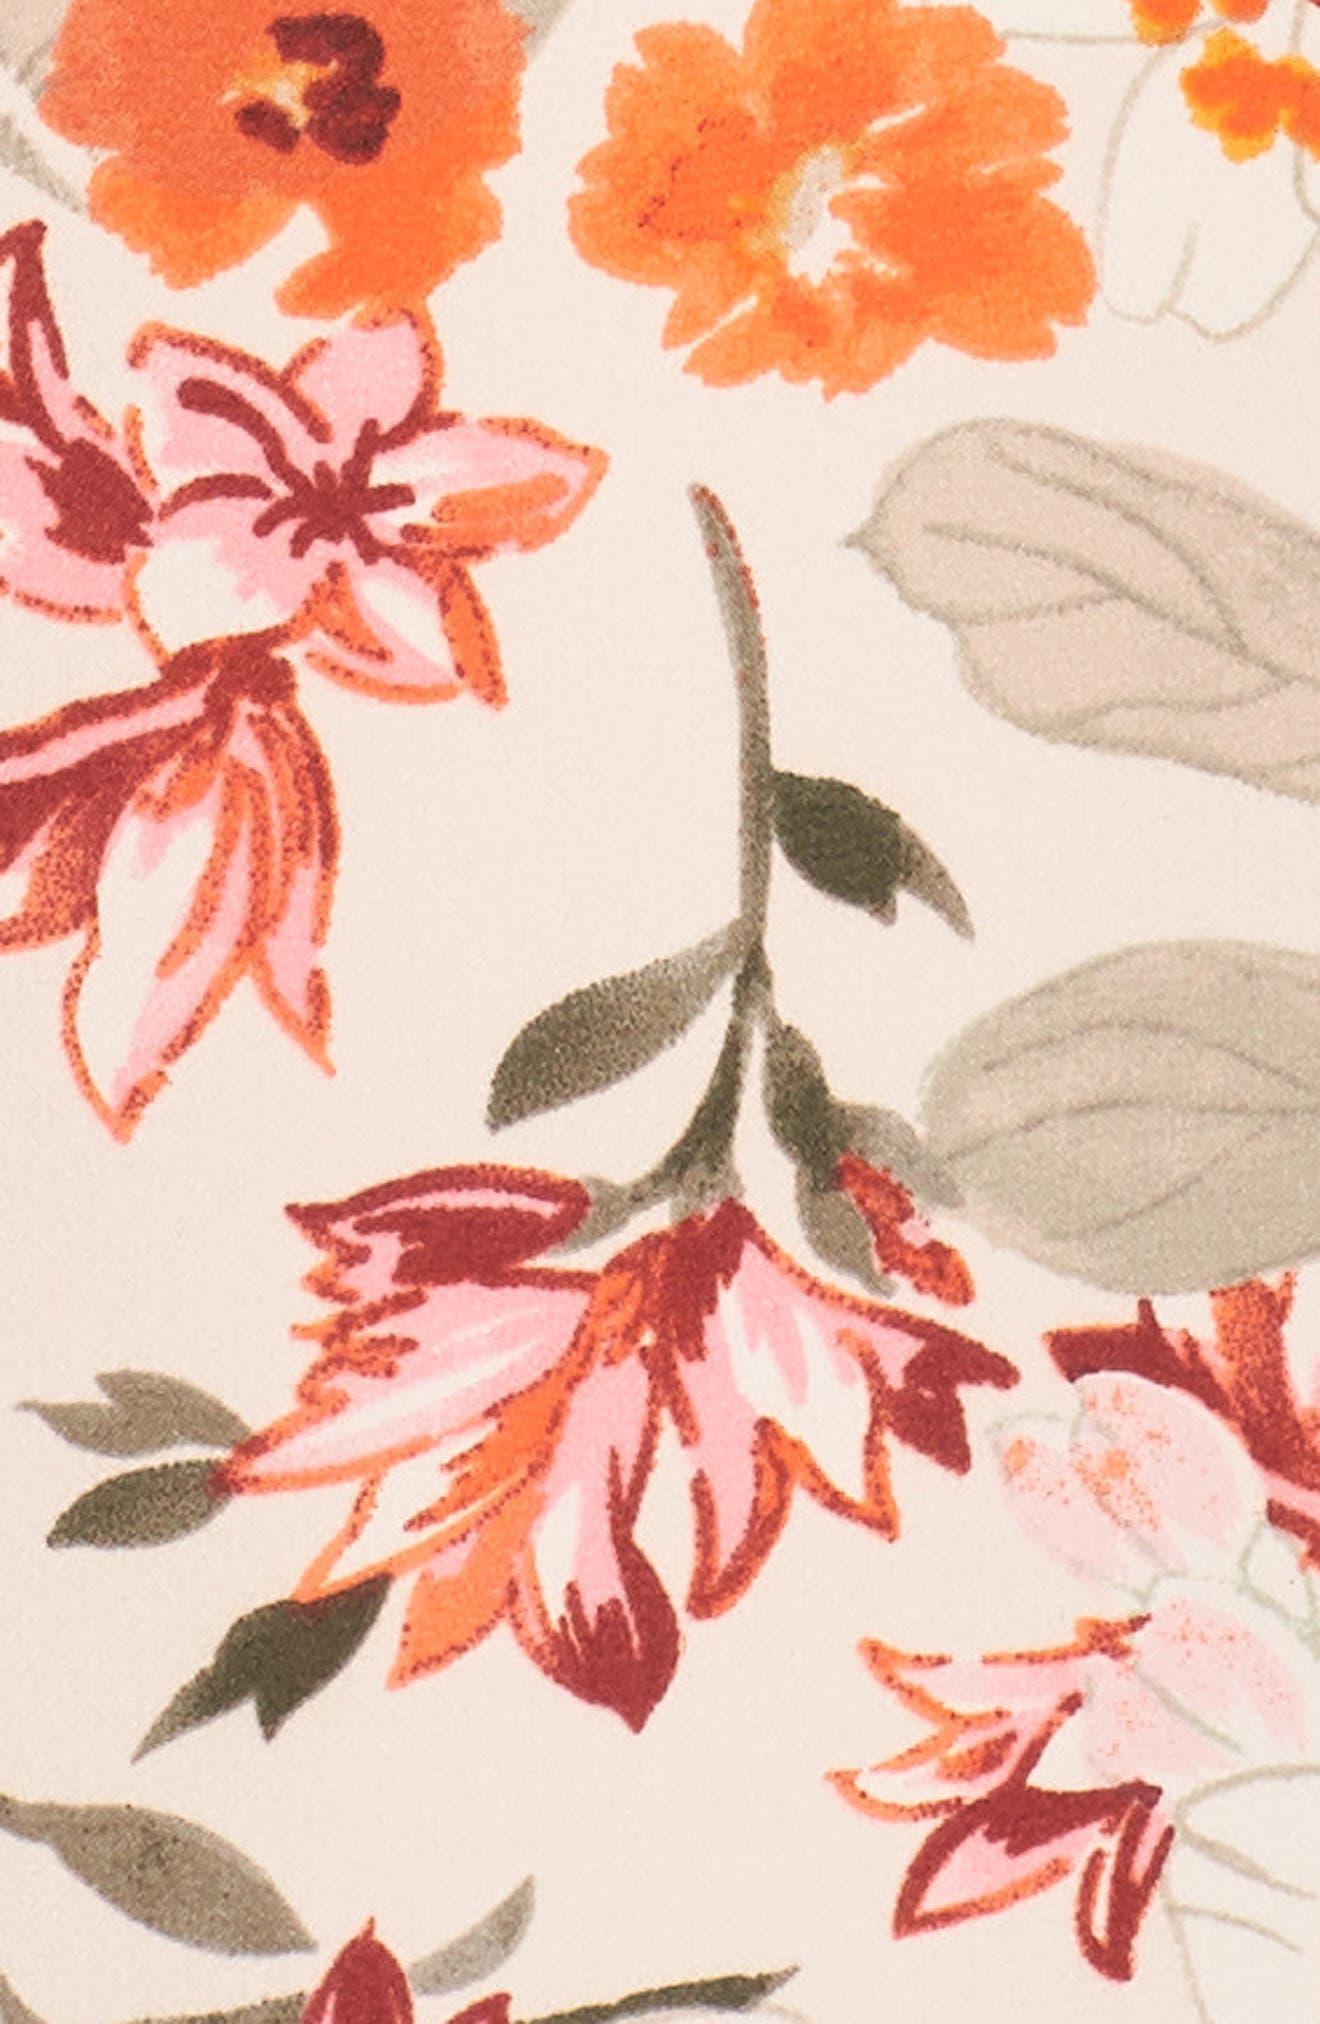 Floral Ruffle Sleeve Maxi Dress,                             Alternate thumbnail 6, color,                             640